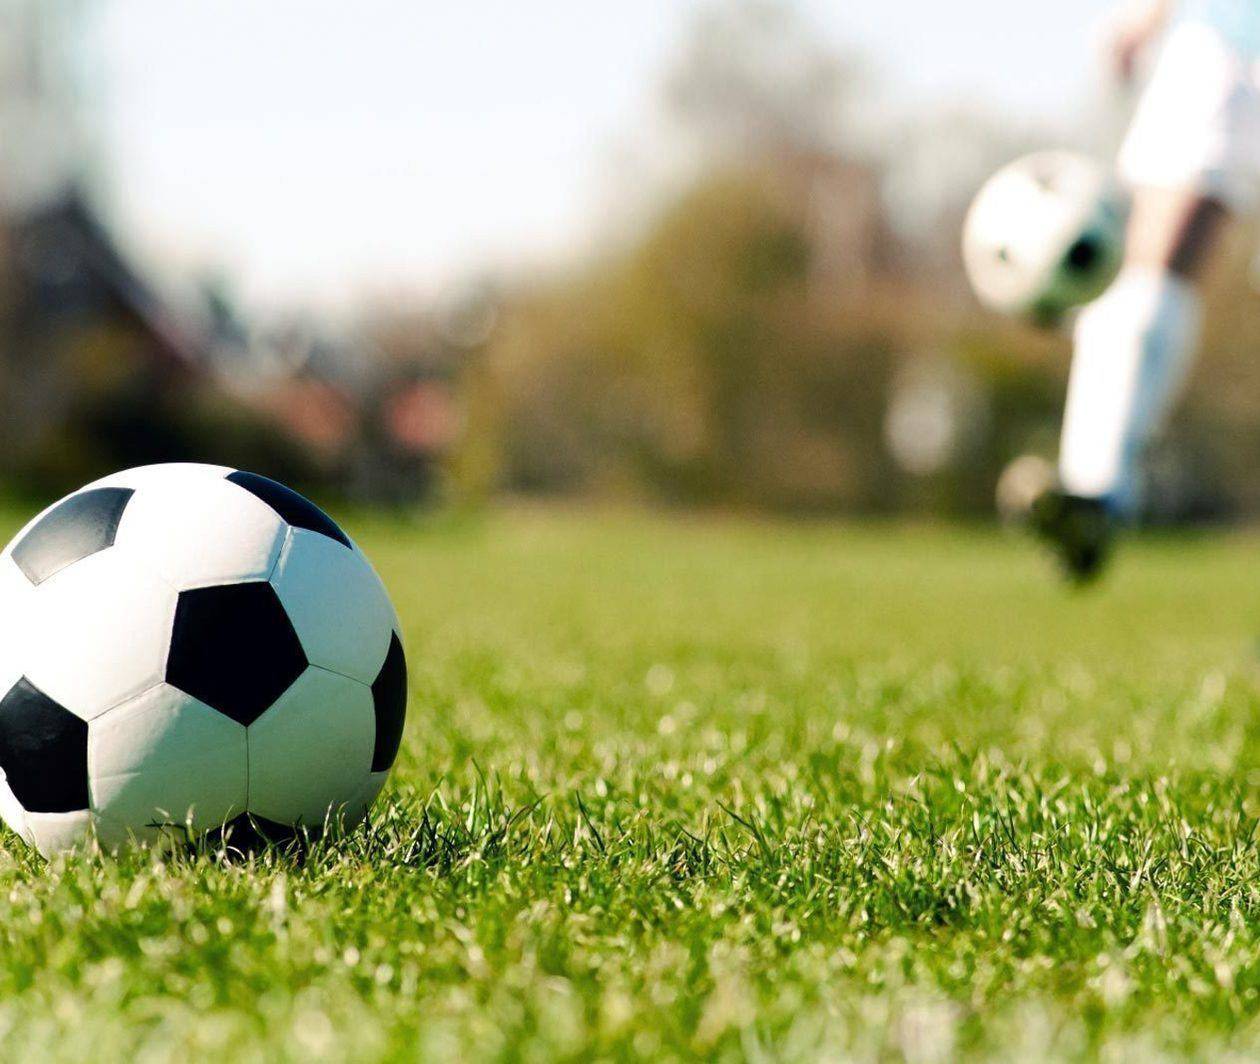 Football: More than a Game